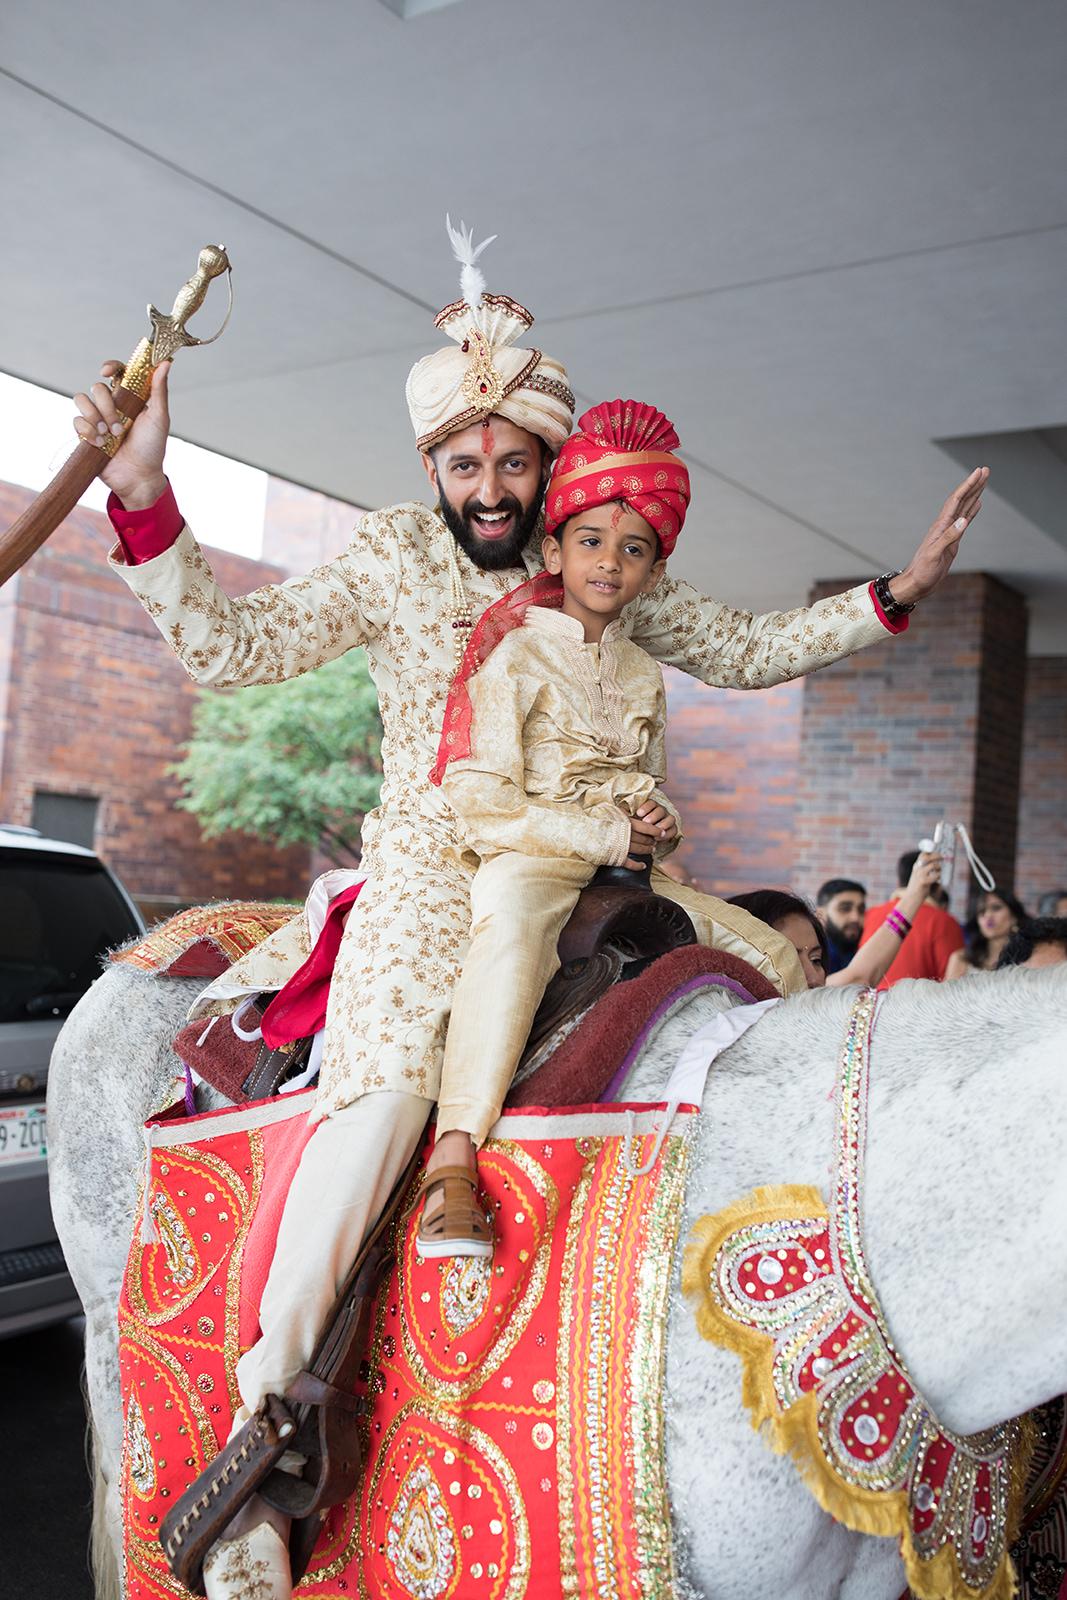 Le Cape Weddings - Sumeet and Chavi - Baraat --21.jpg